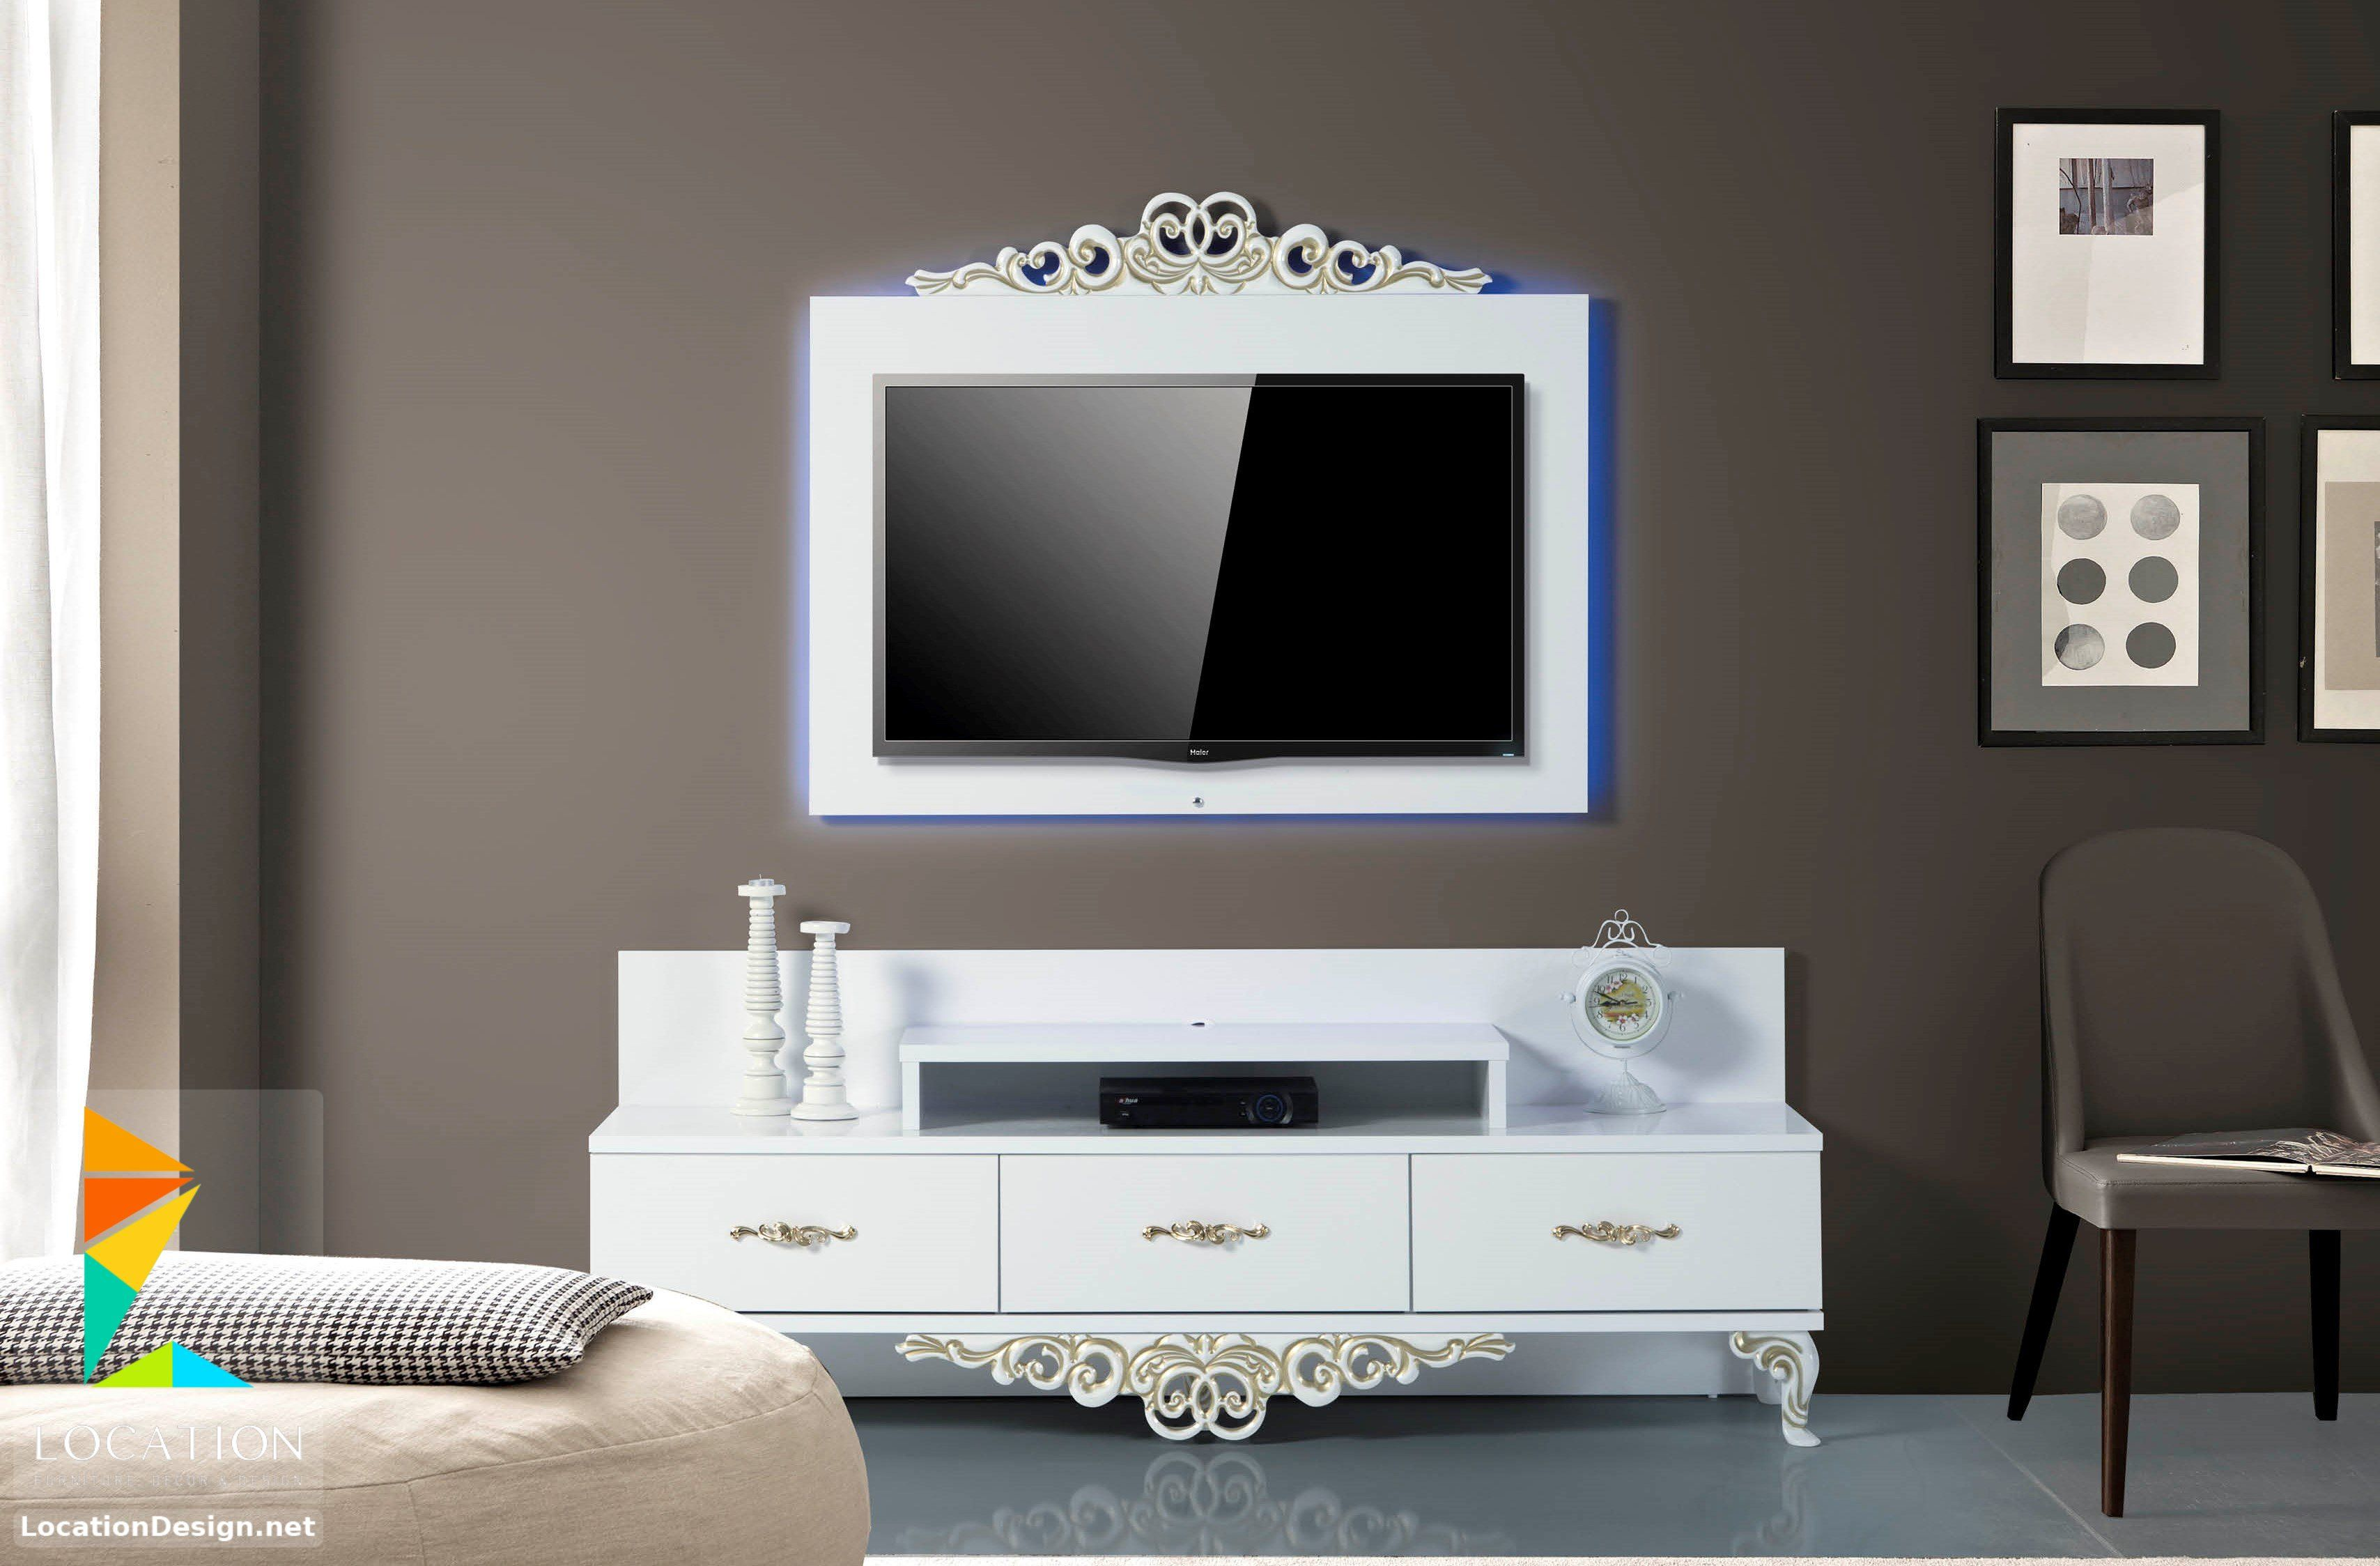 رفوف خشبية للتلفاز مكتبات شاشات Lcd مودرن Tv Unit Design Design Home Decor